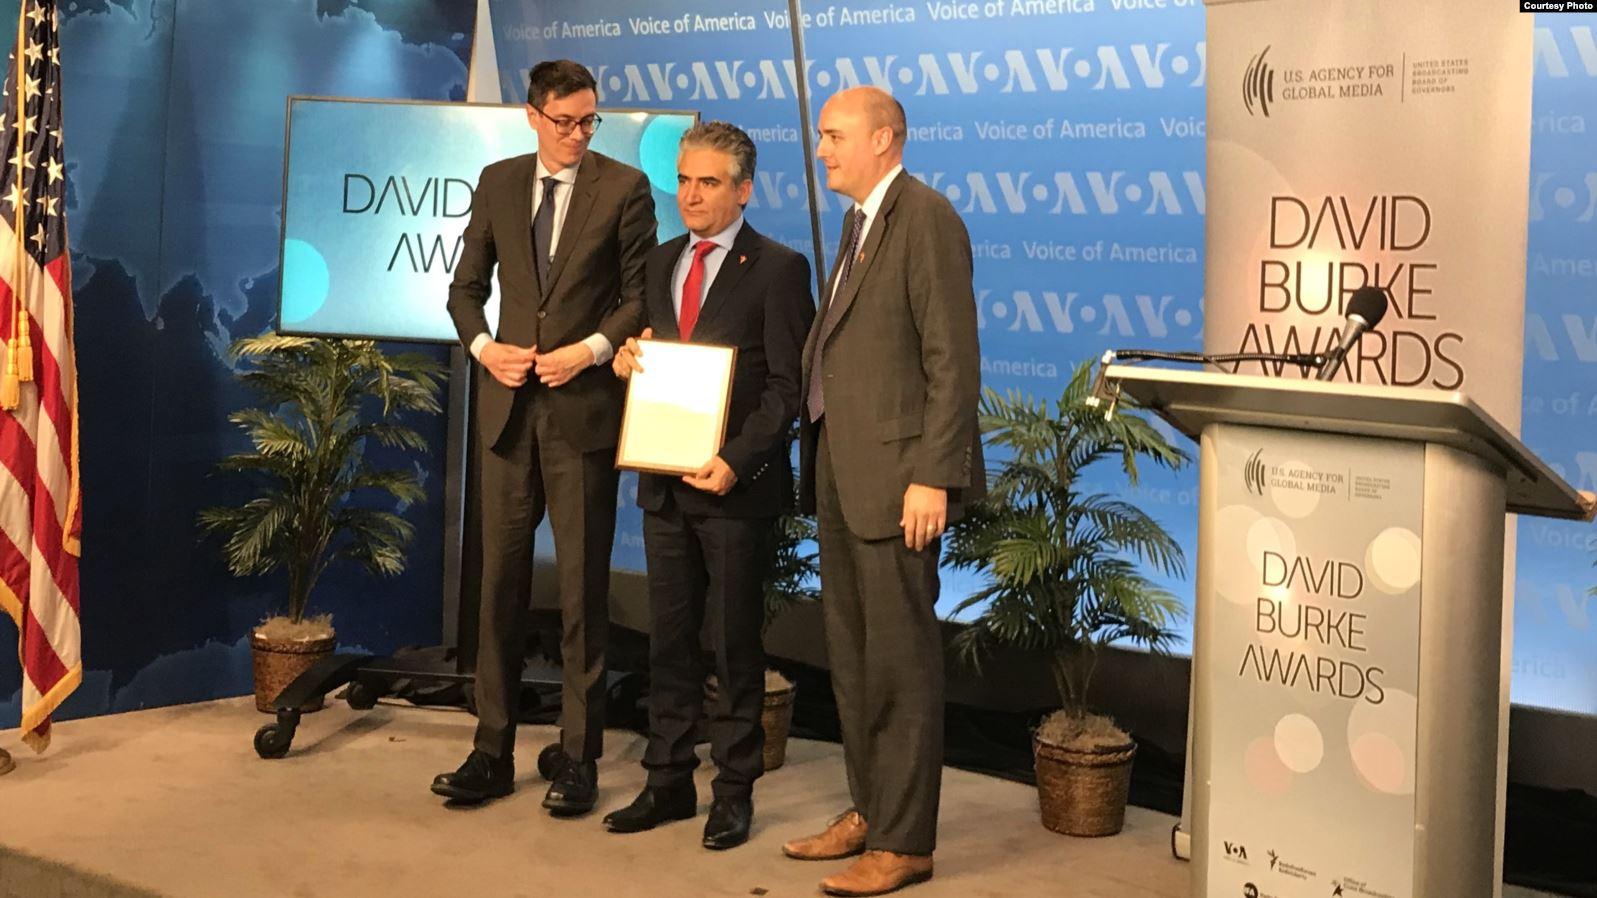 RFE/RL Afghan Service receives David Burke journalism award